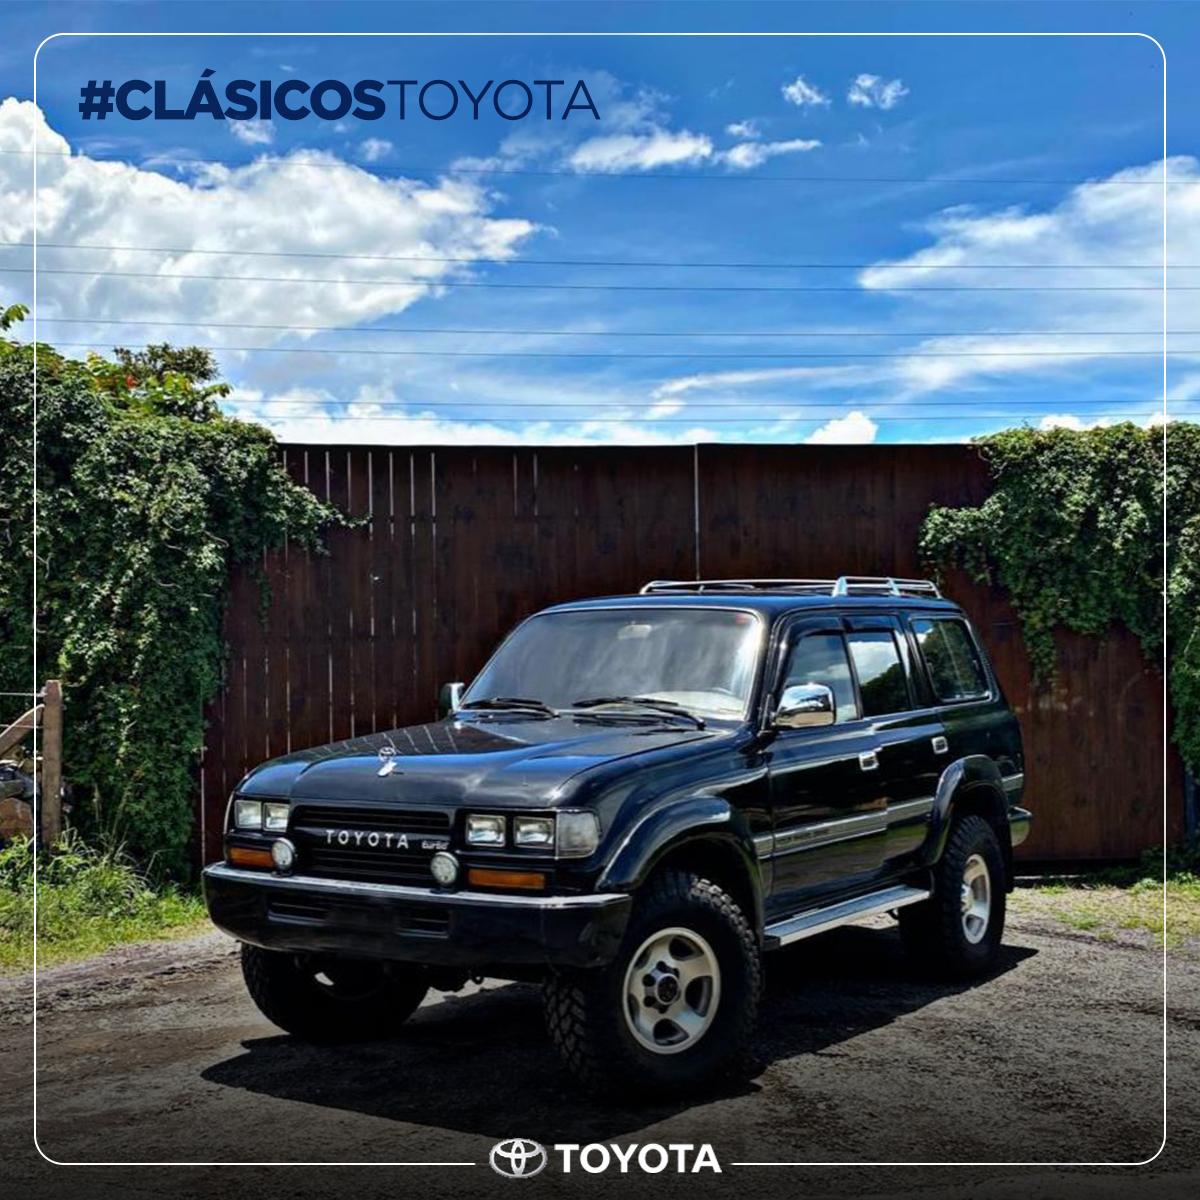 Toyota Land Cruiser HDJ80  📸 Export Cruisers Co. https://t.co/SV1kcUfZoa